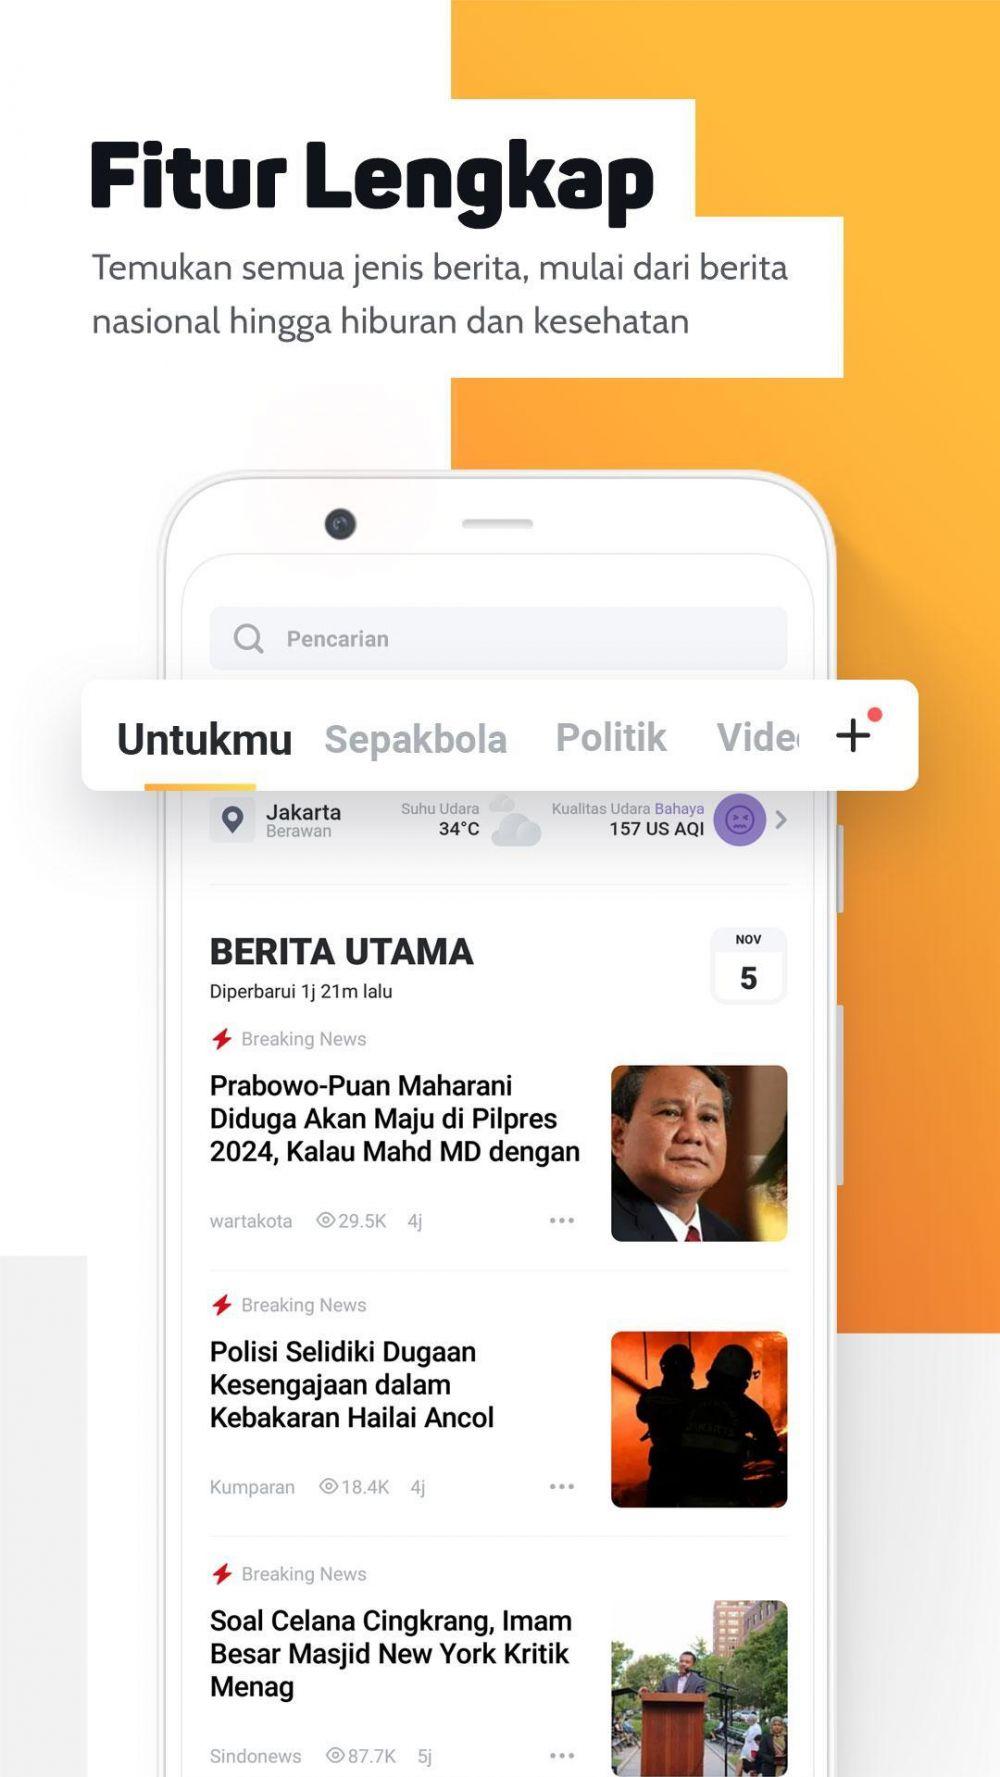 Aplikasi Android terbaik karya anak bangsa © 2020 brilio.net